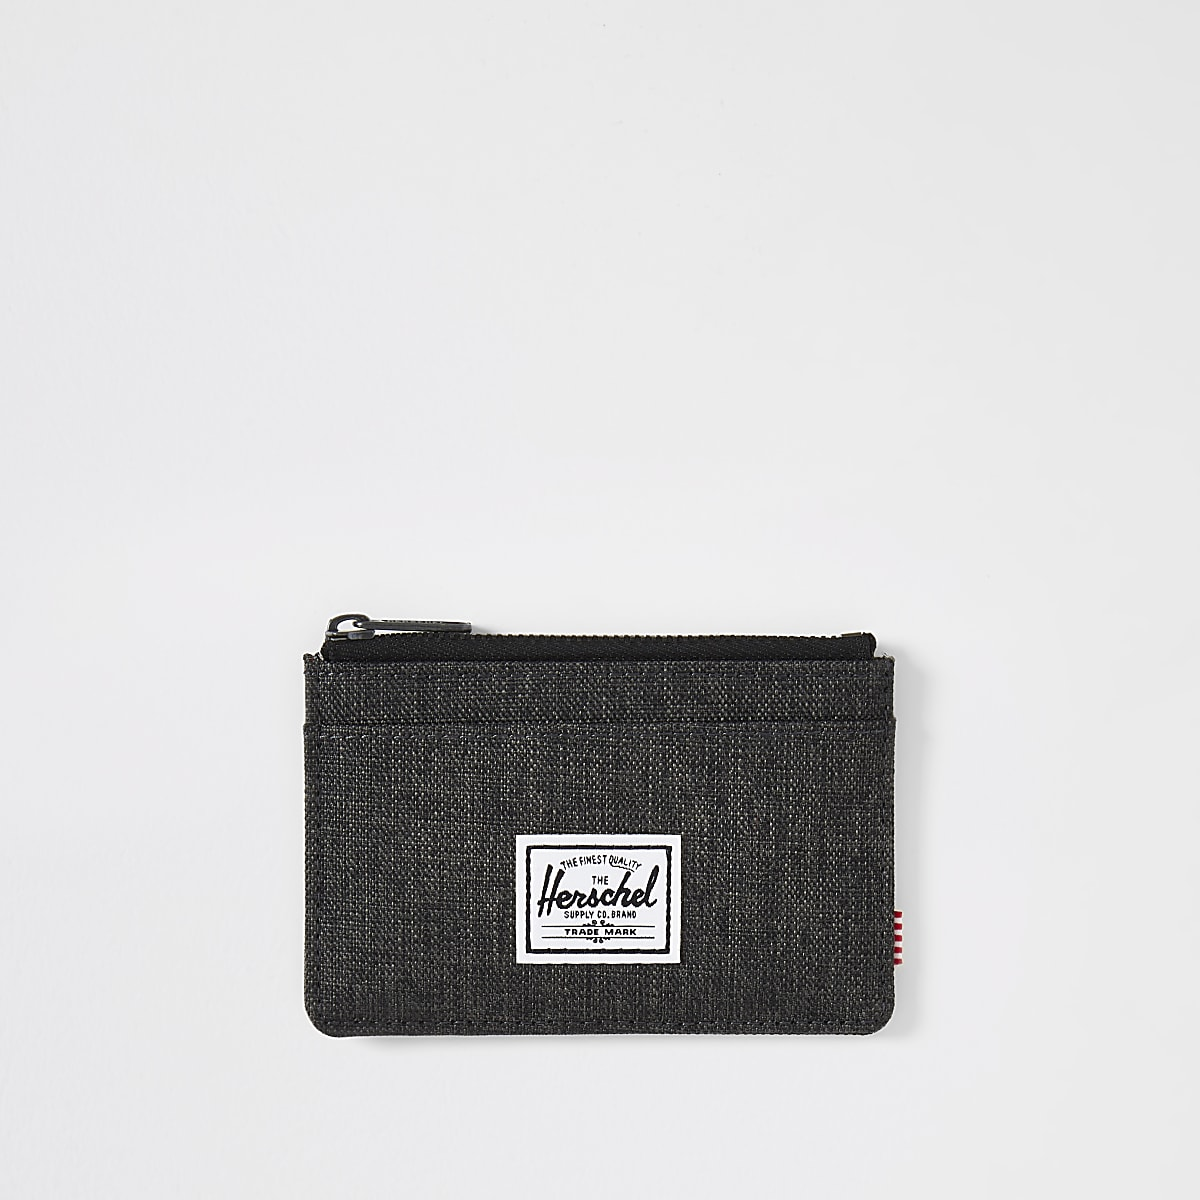 Herschel black Oscar crosshatch cardholder